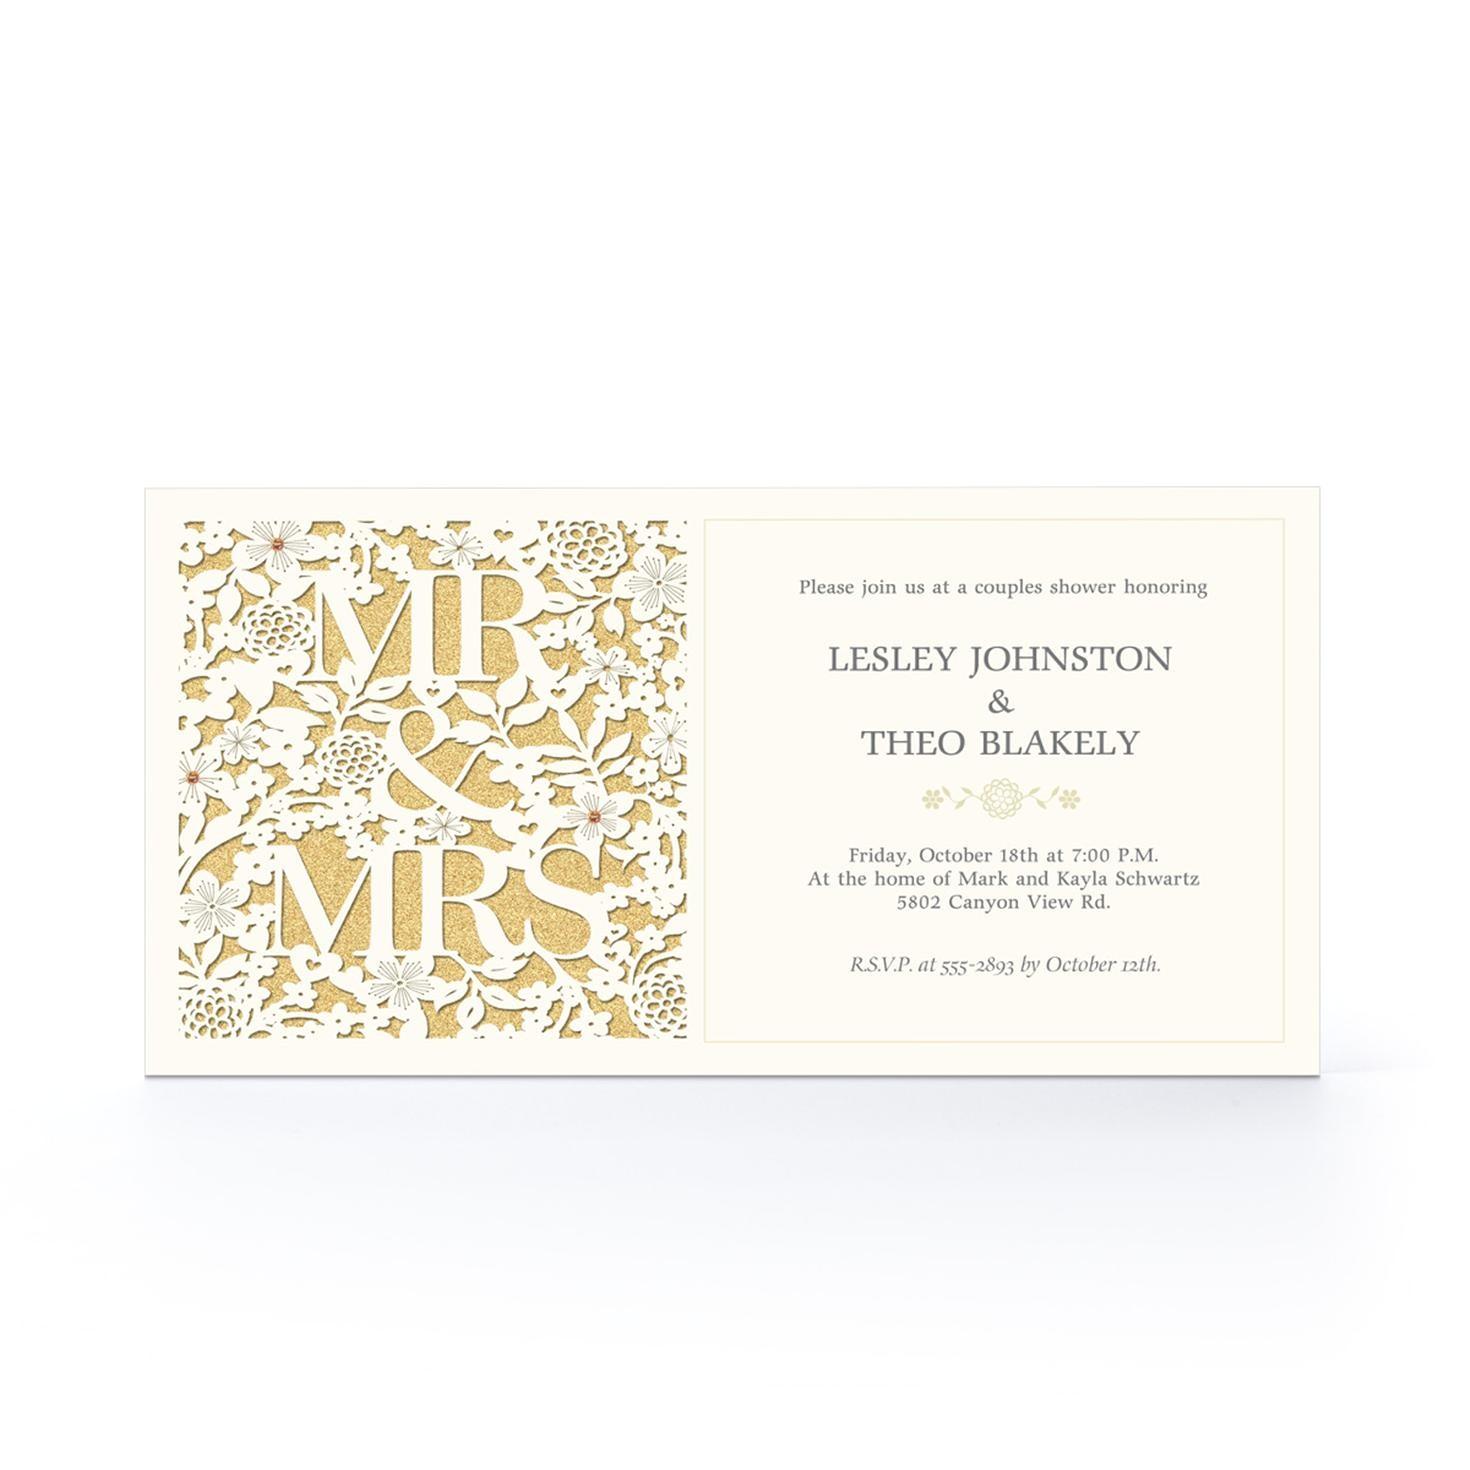 hallmark wedding shower invitations